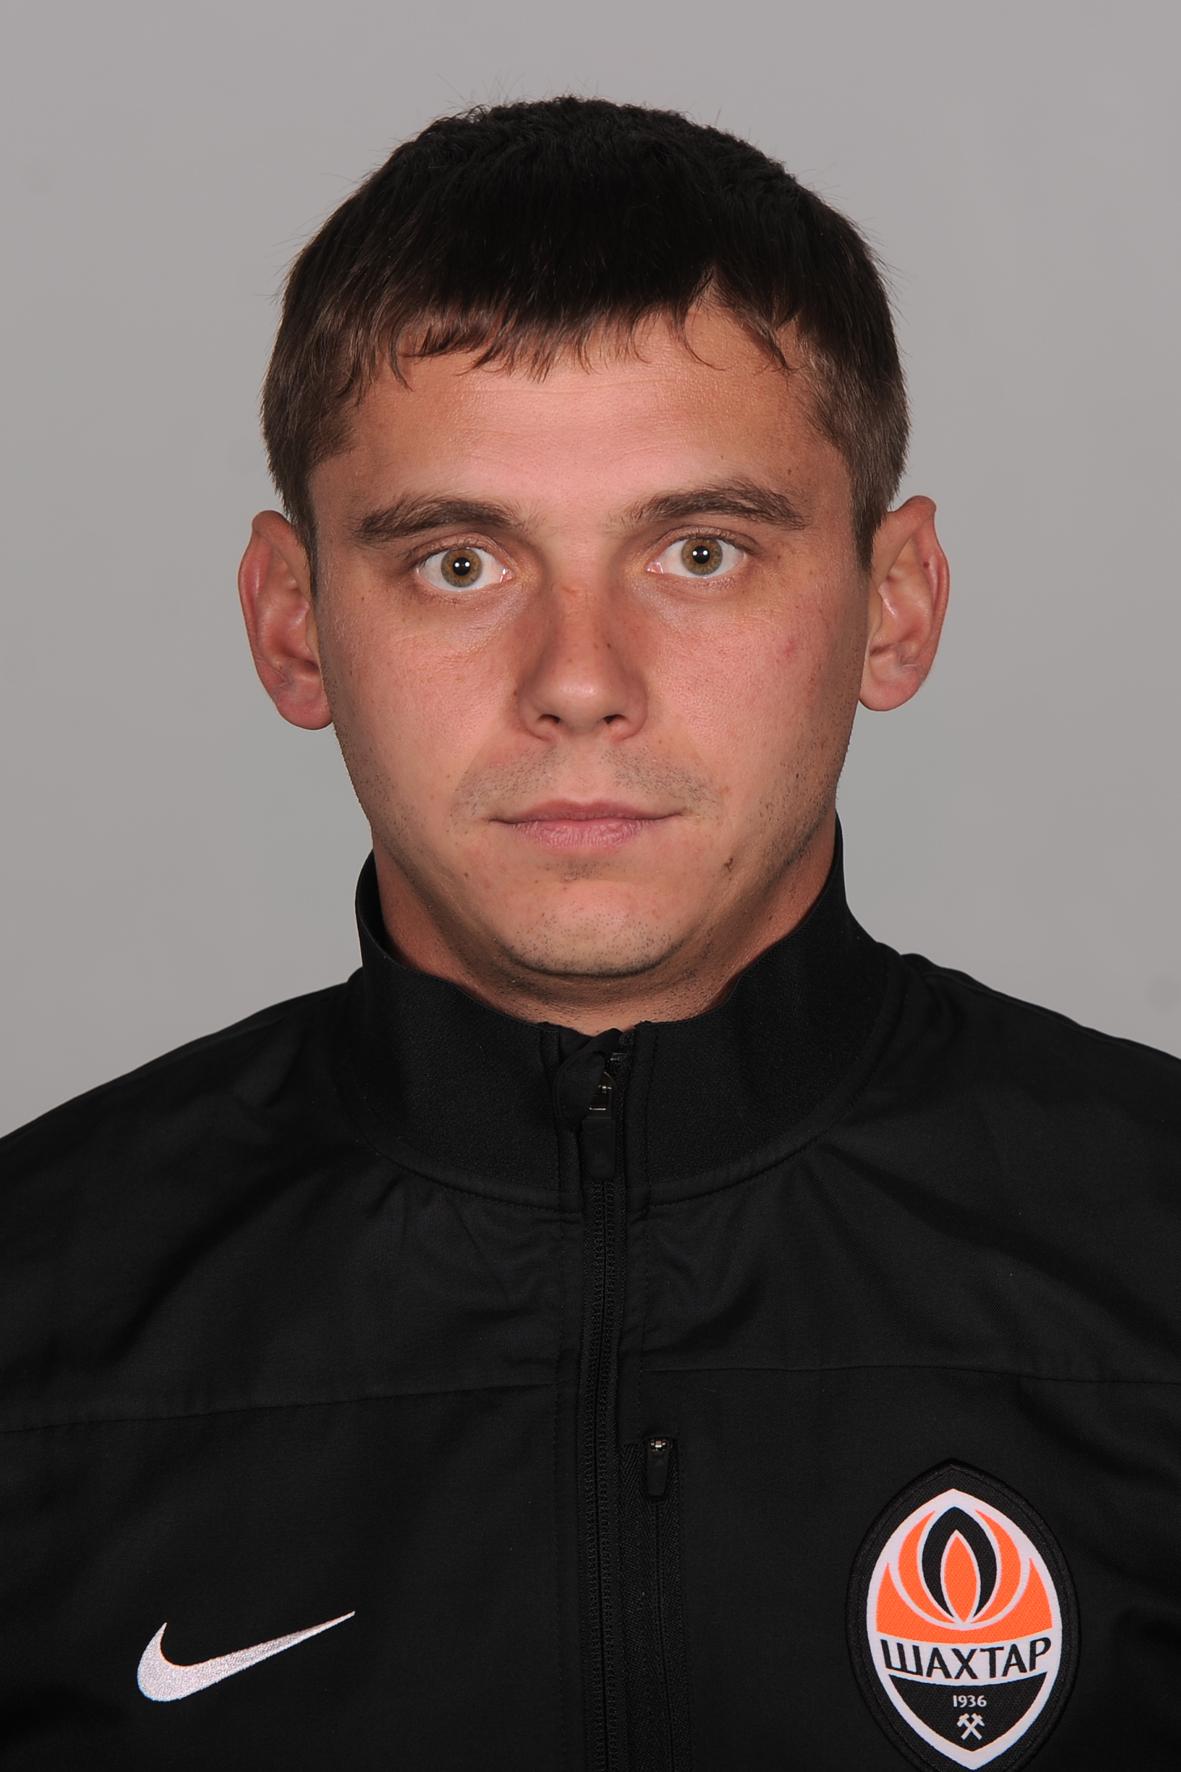 Ефимов Дмитрий  Юриевич